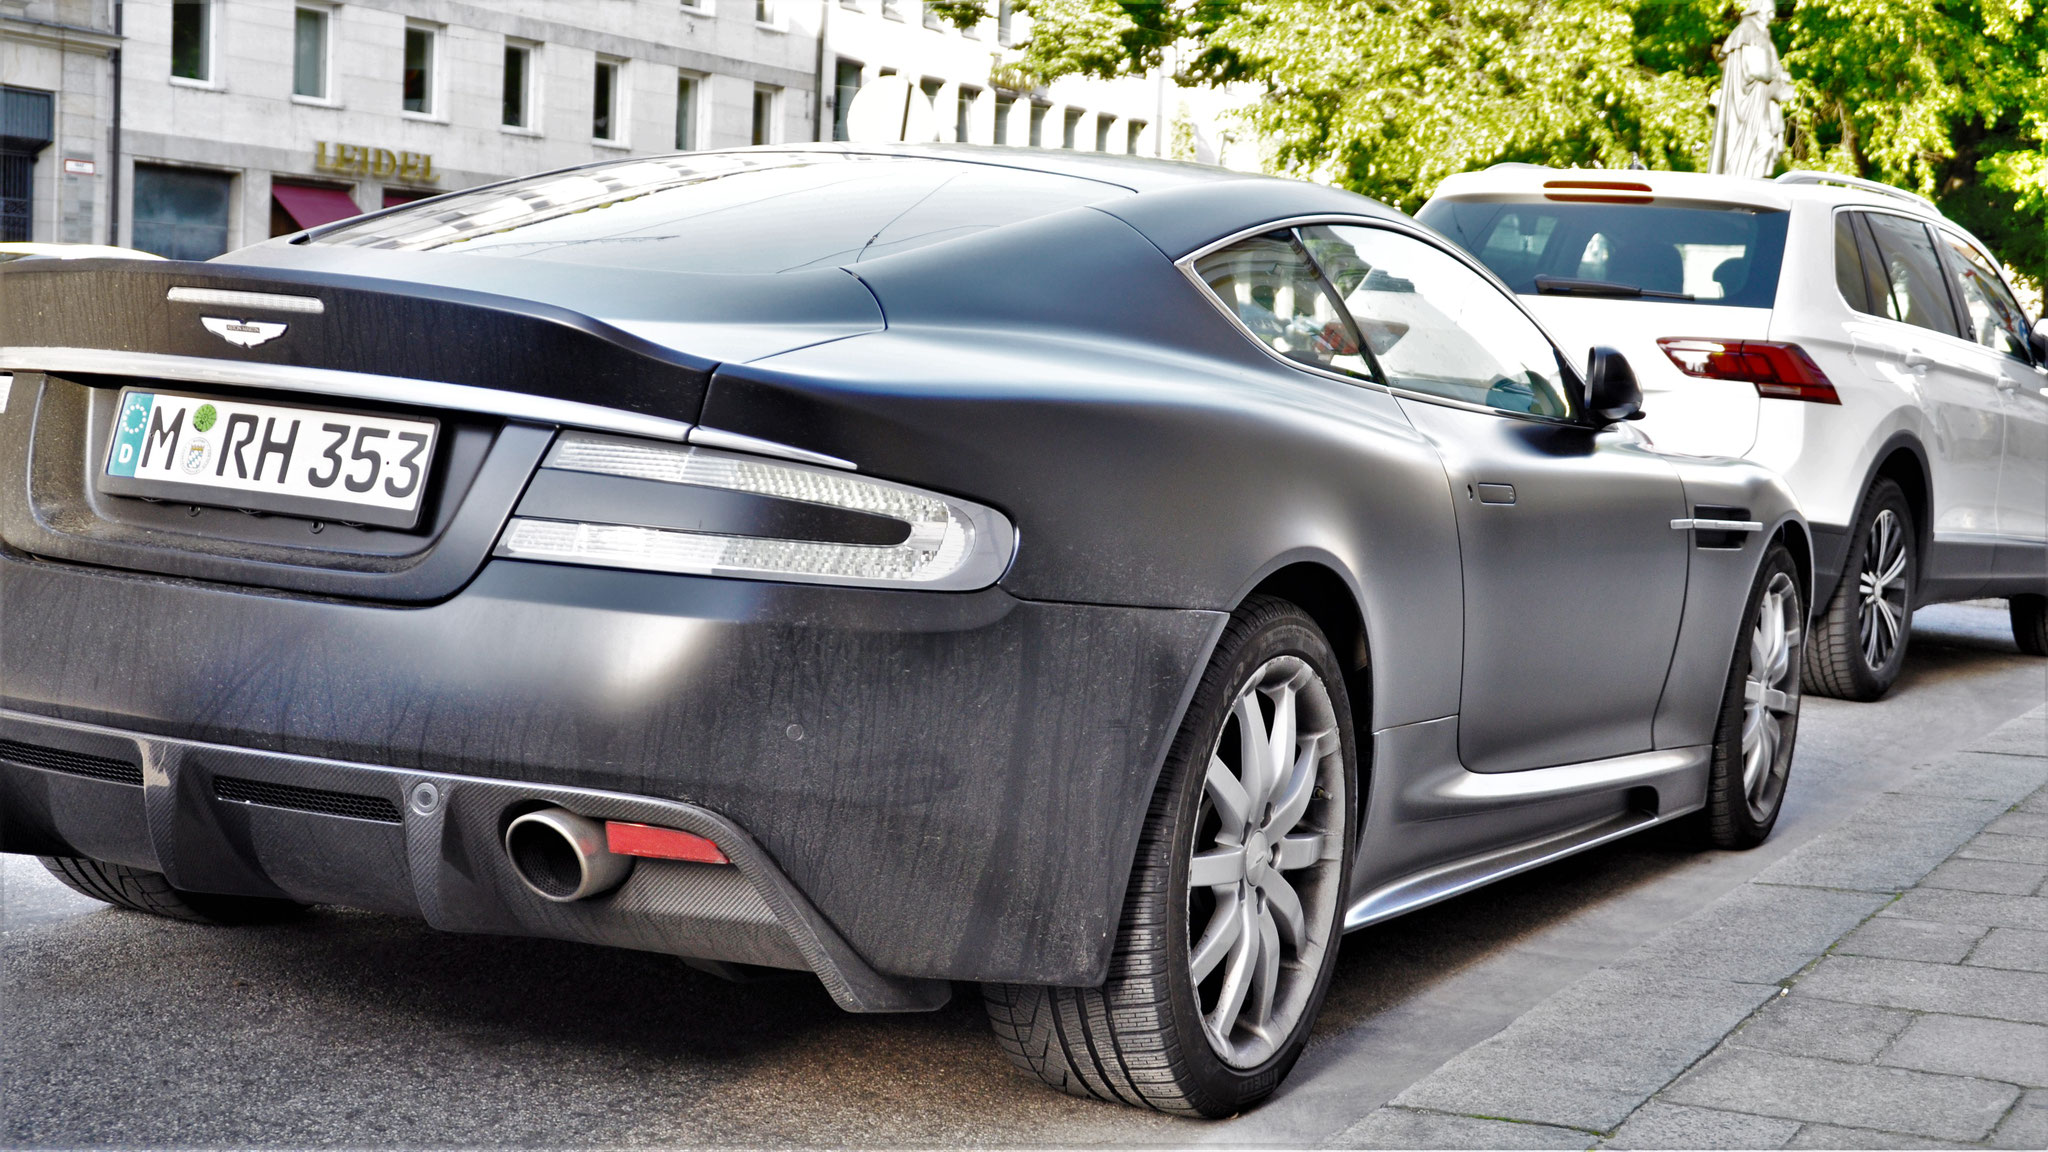 Aston Martin DBS - M-RH-353